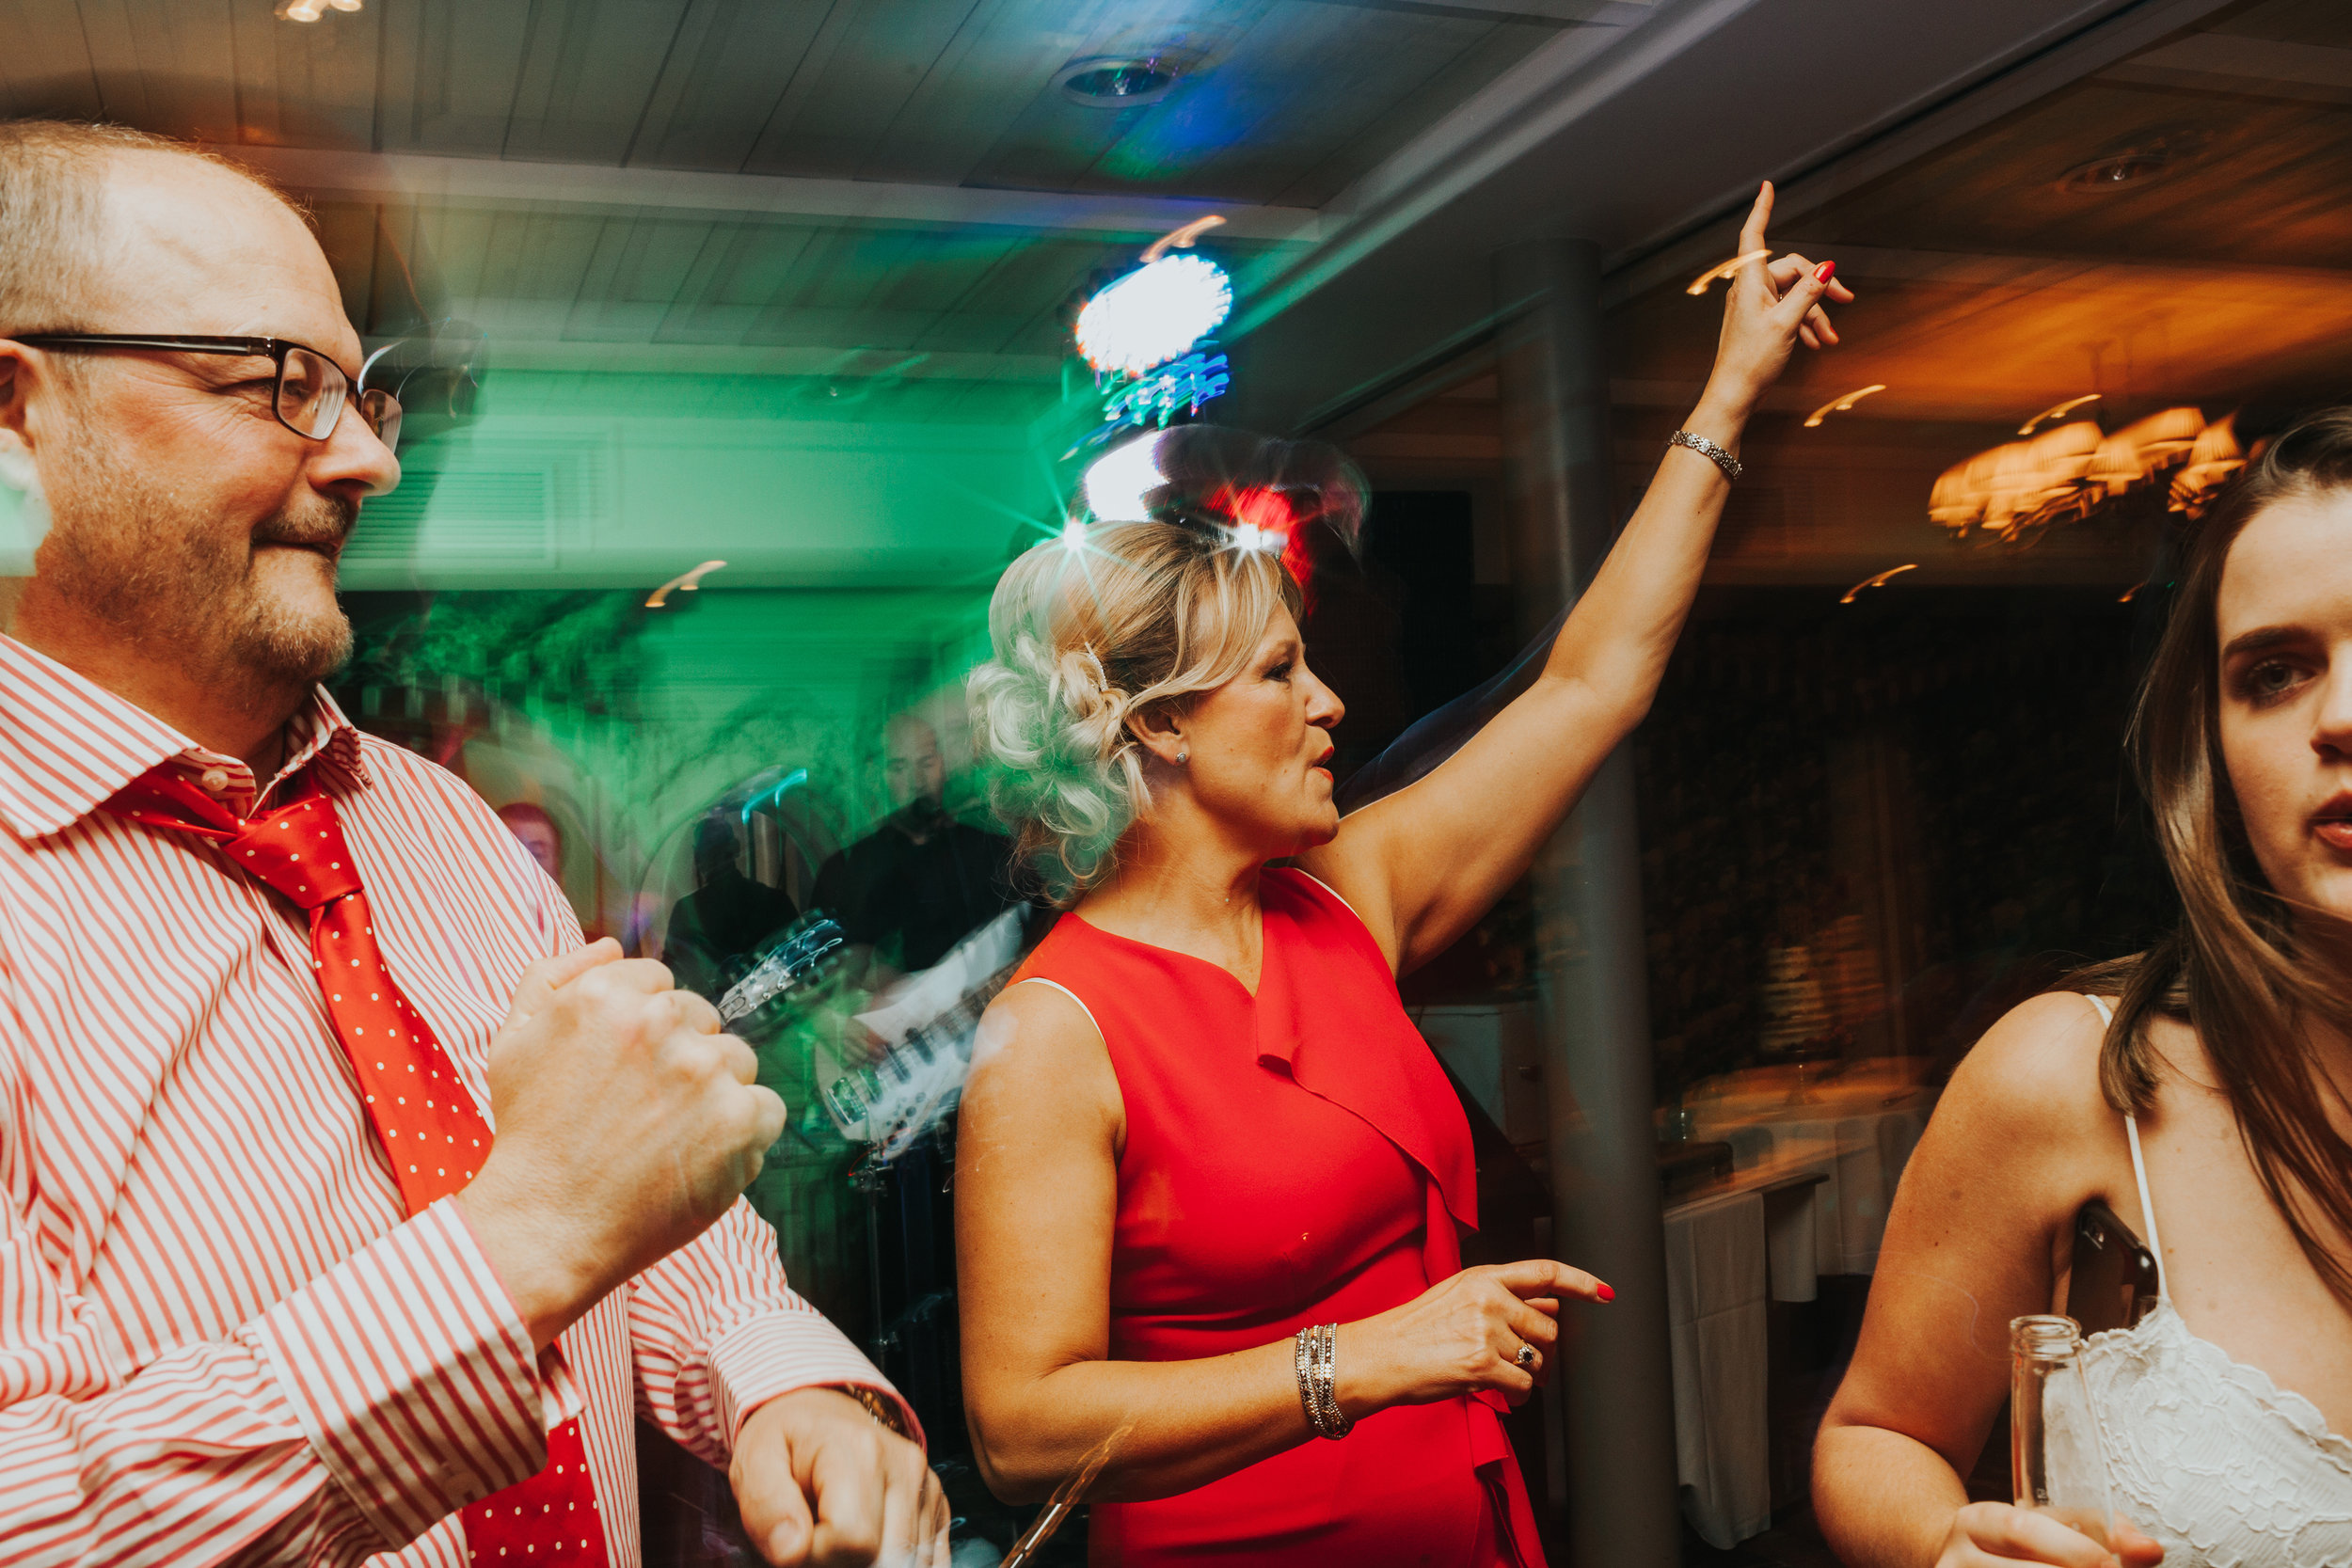 Guests dancing, slow shutter speed effect.